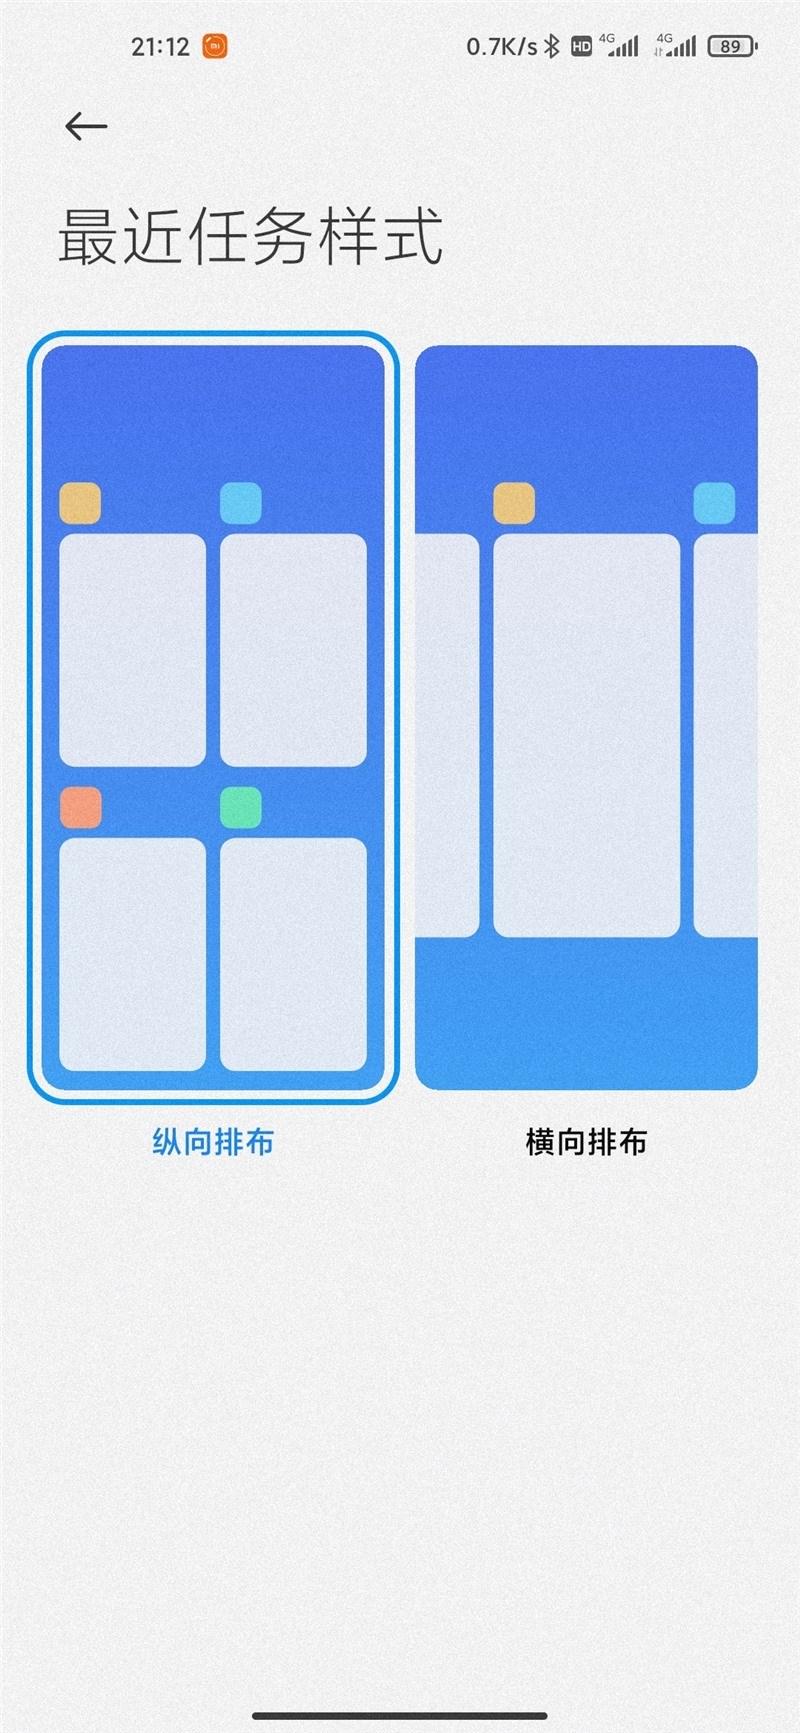 nakładka Xiaomi MIUI 12 nowy podgląd multitasking aktualizacja kafelki